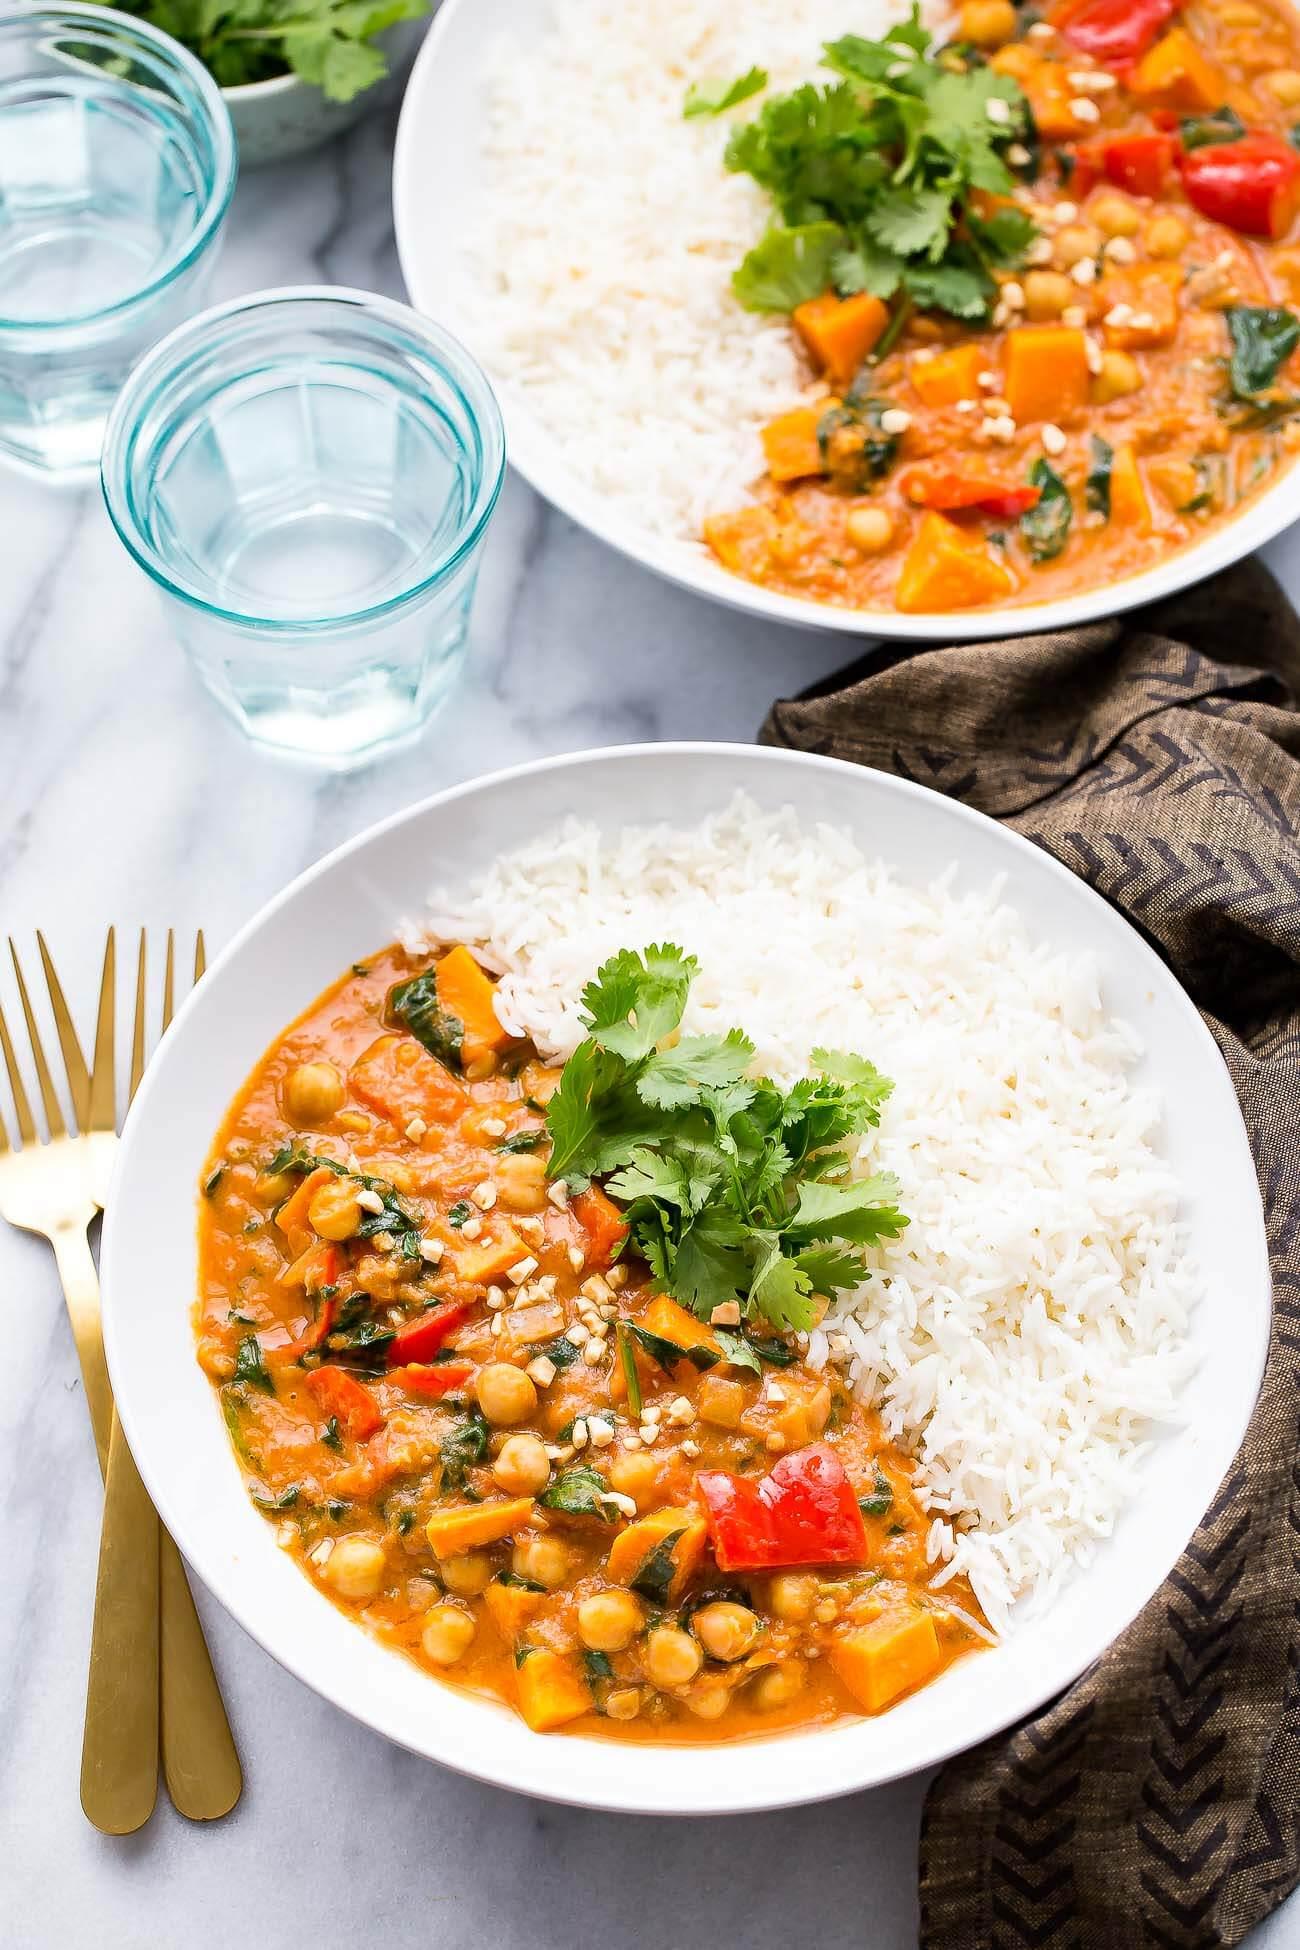 Slow-Cooker-African-Inspired-Peanut-Stew-5-1.jpg